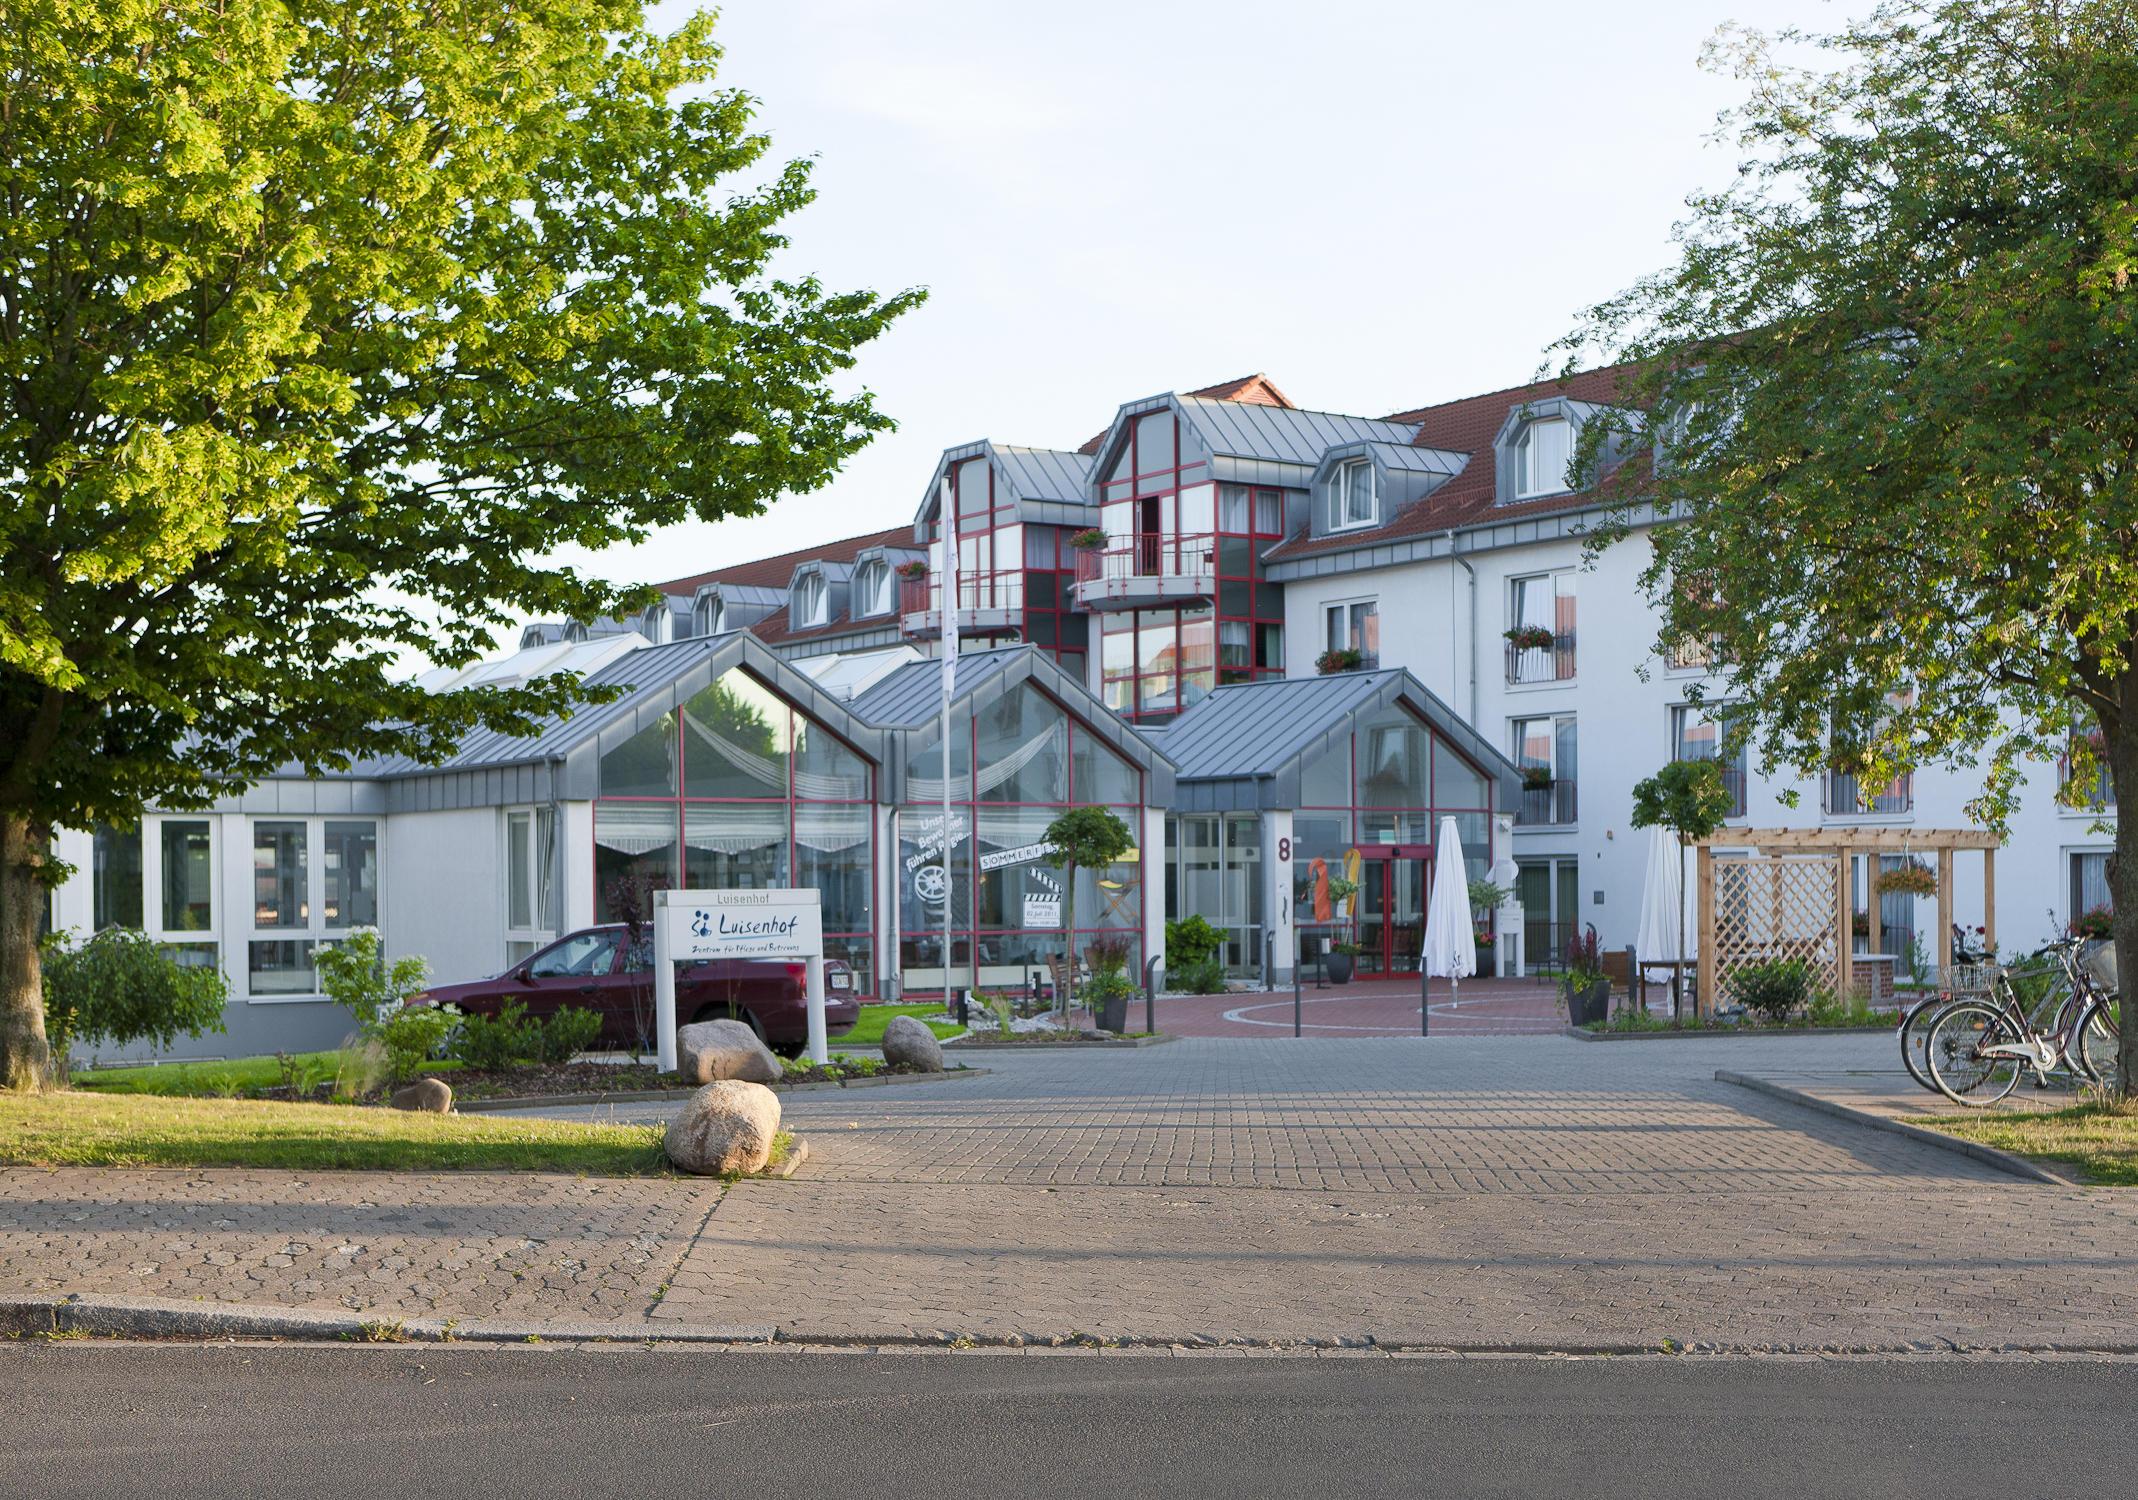 SenVital Senioren- und Pflegezentrum Göttingen Luisenhof